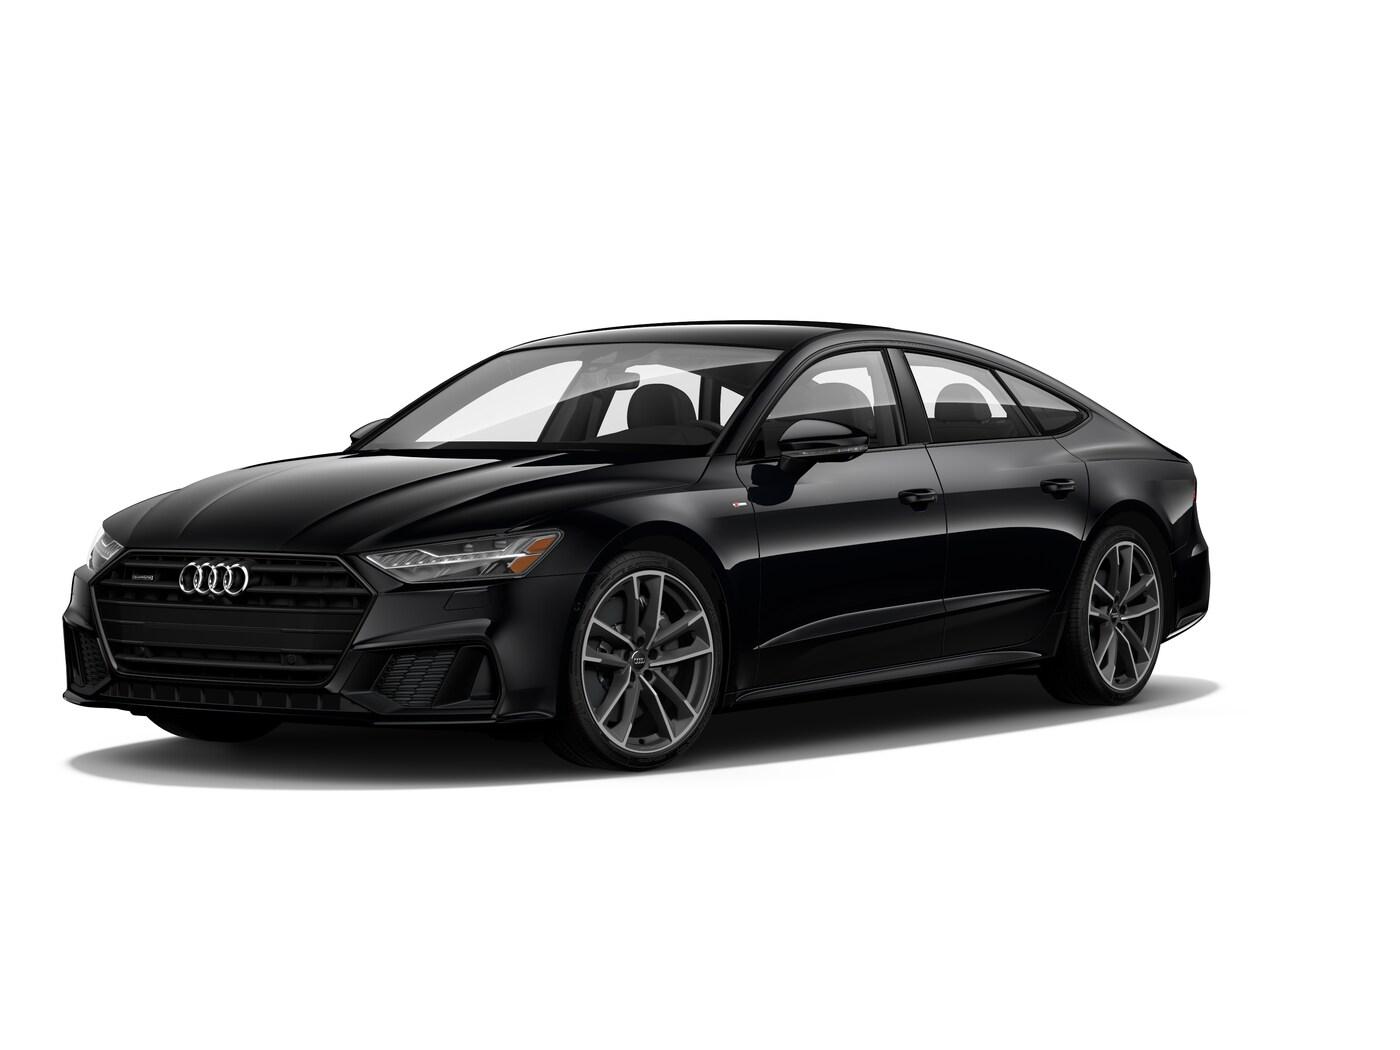 2020 Audi A7 Sportback